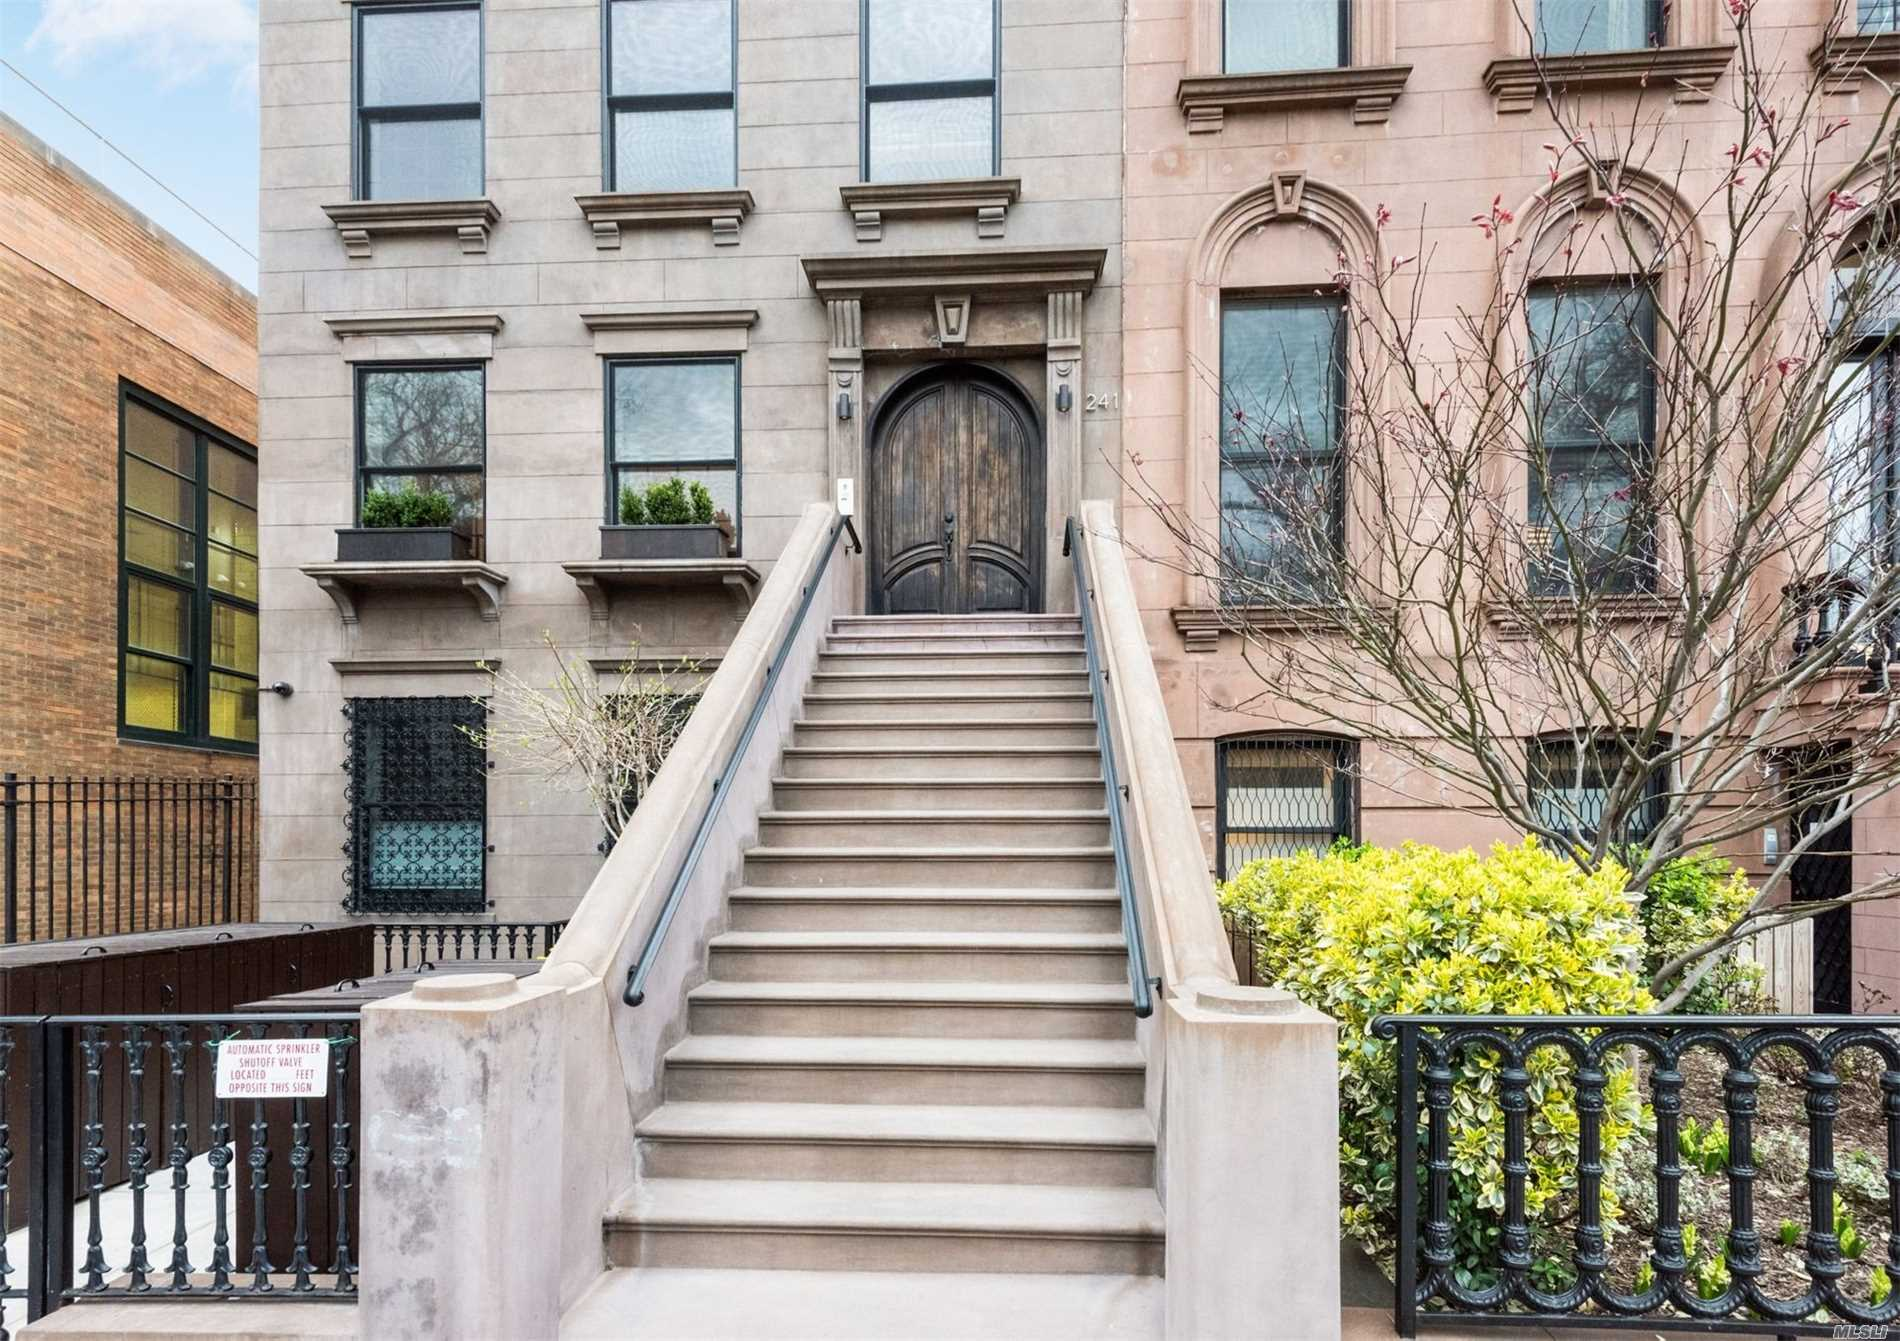 241 Carroll St, 3 - Carroll Gardens, New York